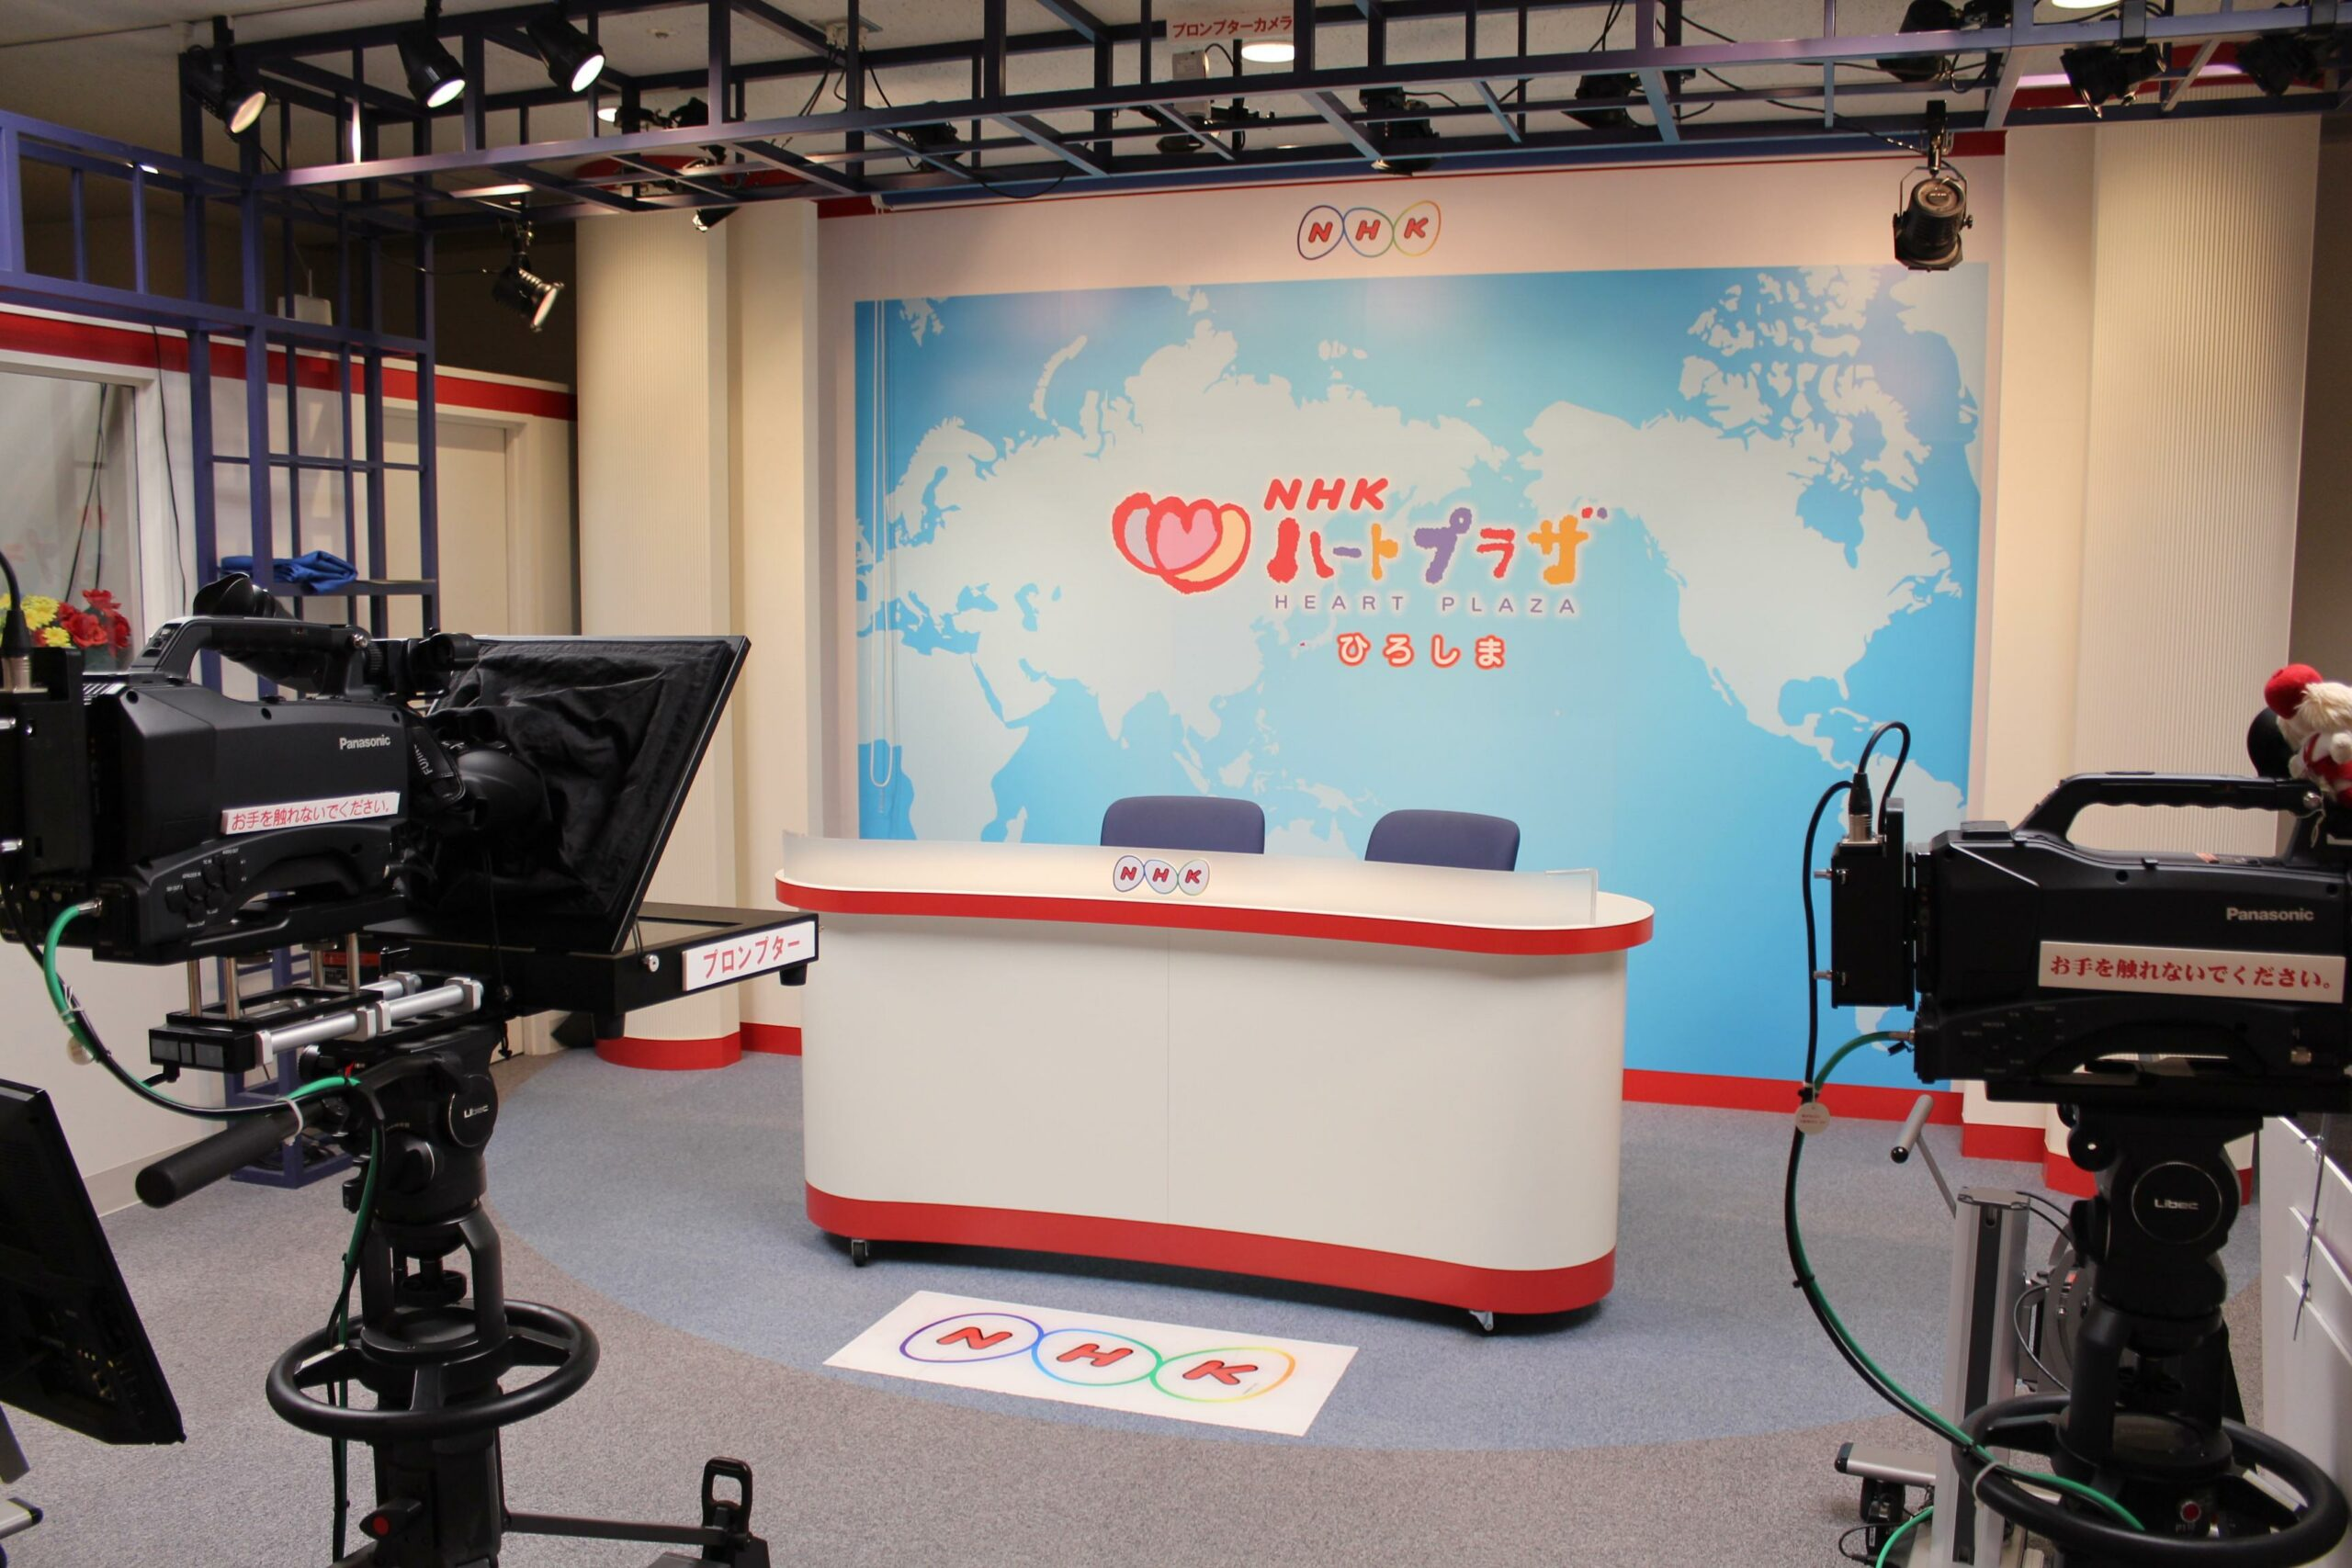 NHK広島放送局 ハートプラザ見学(広島市)